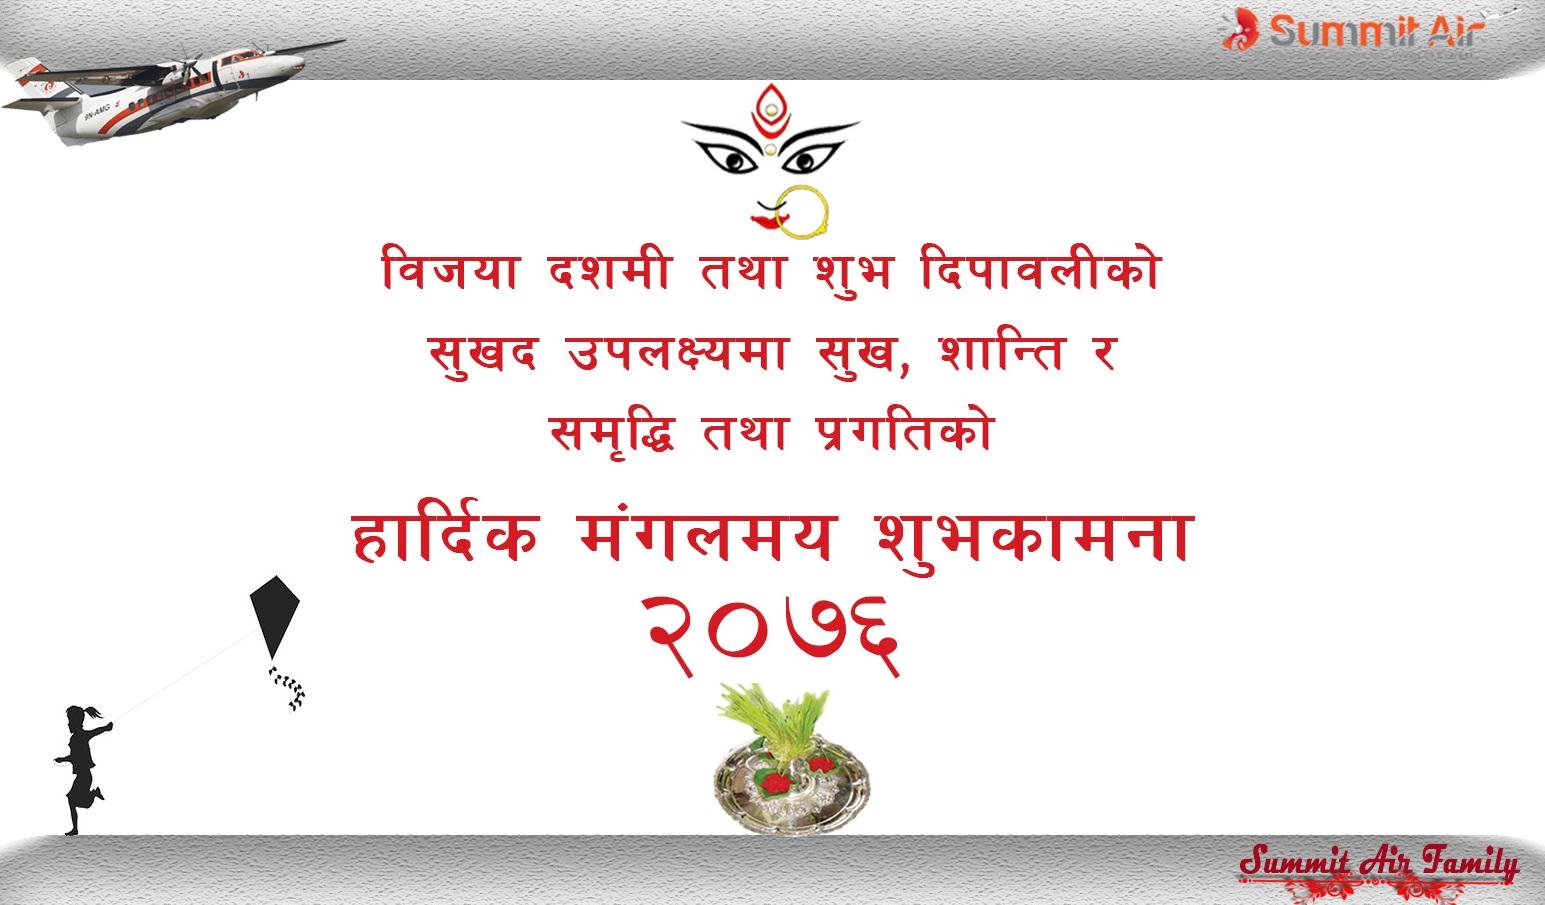 Summit Air Dashai Wish